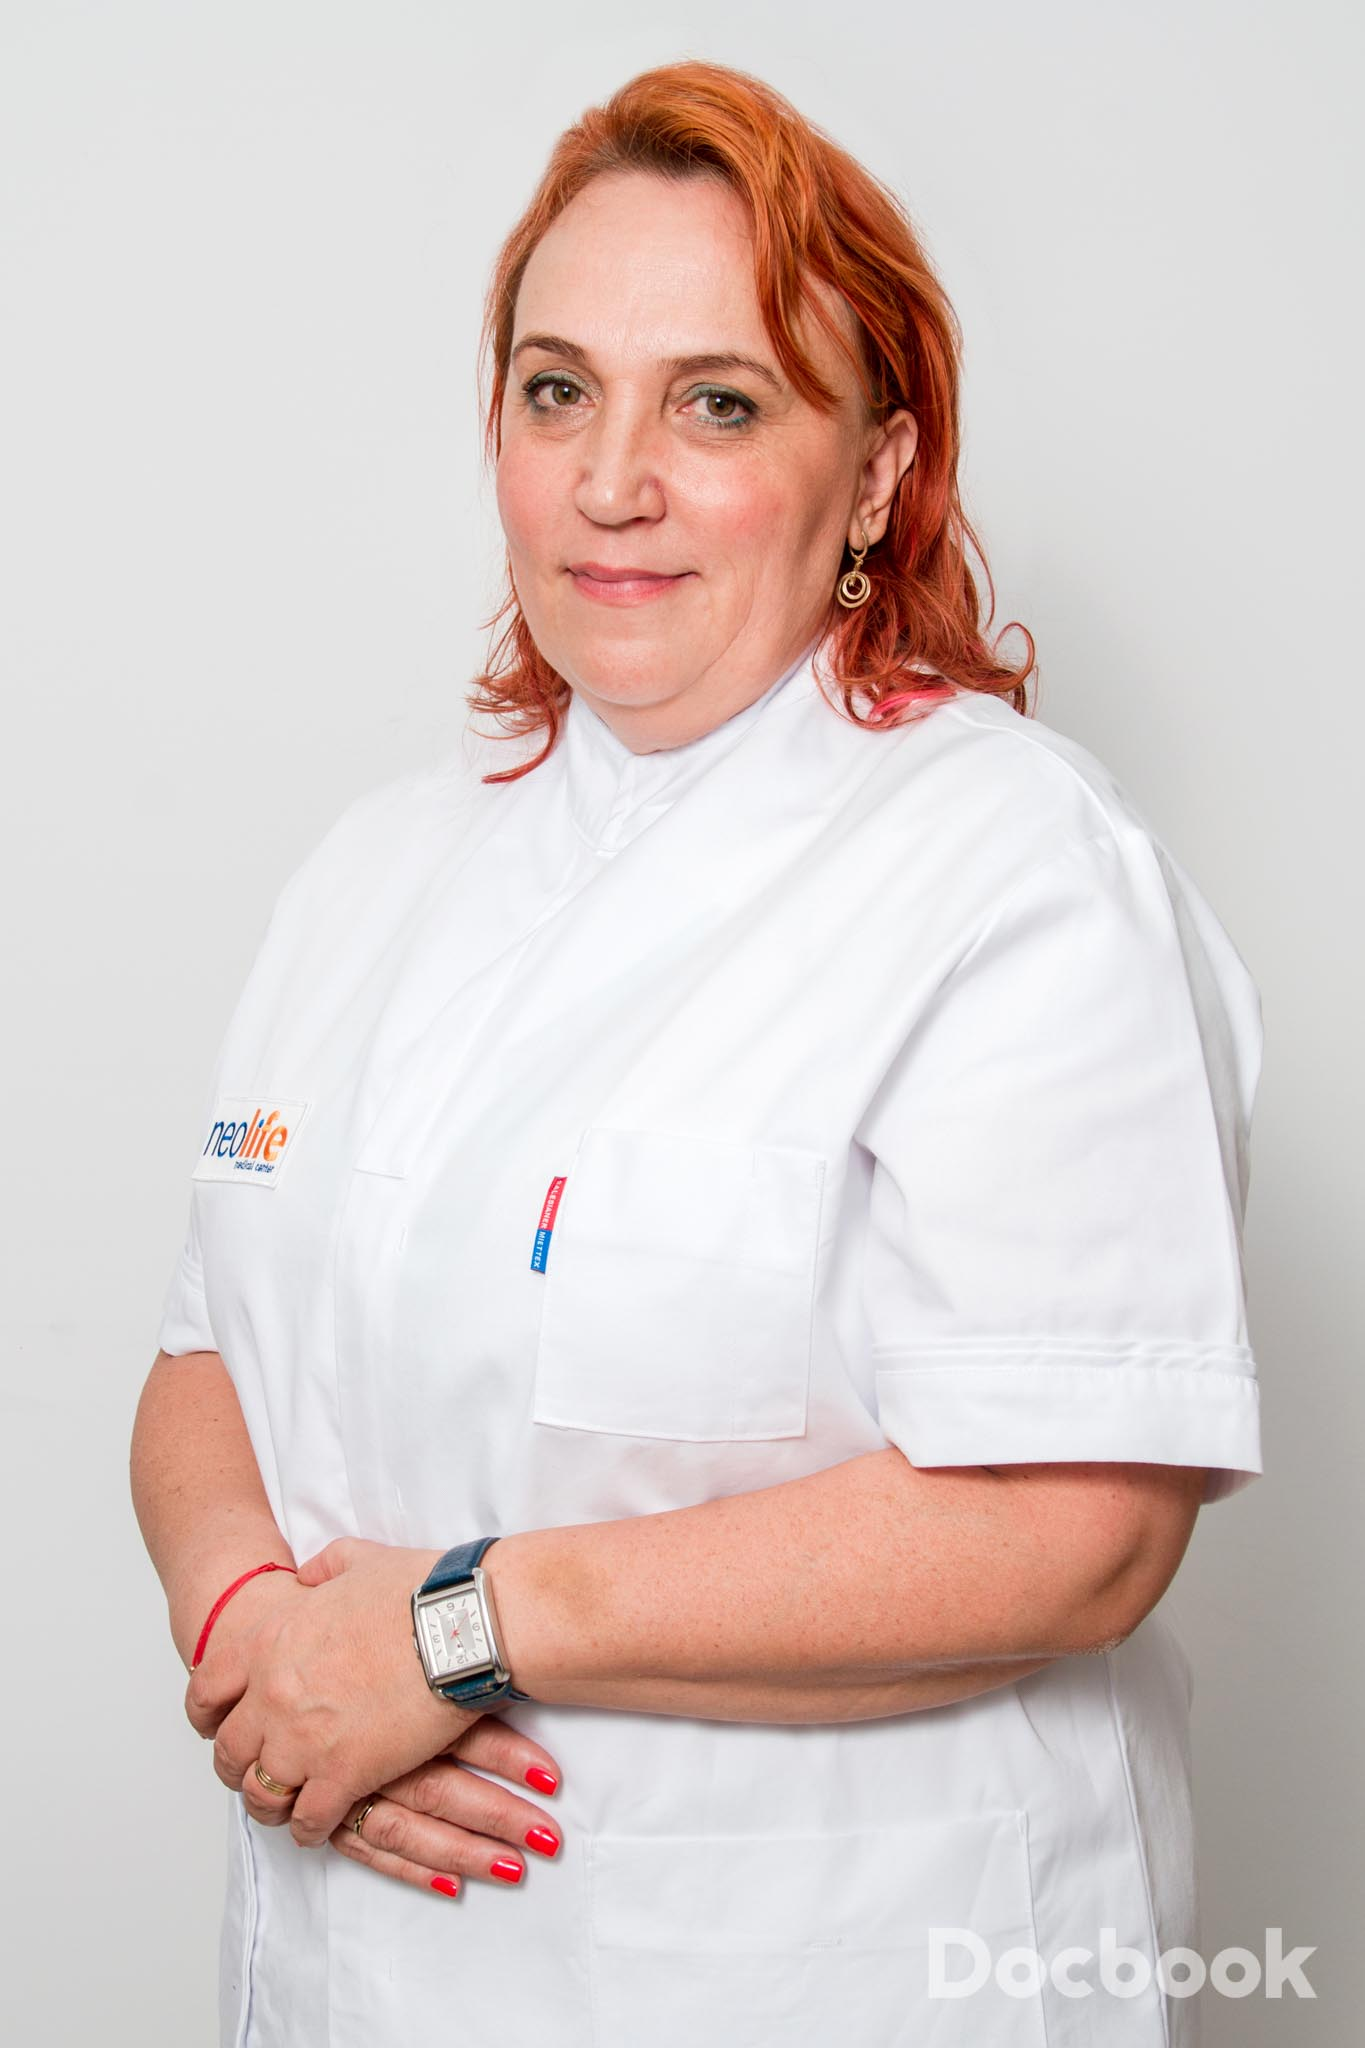 Dr. Amalia Luminita Constantinescu